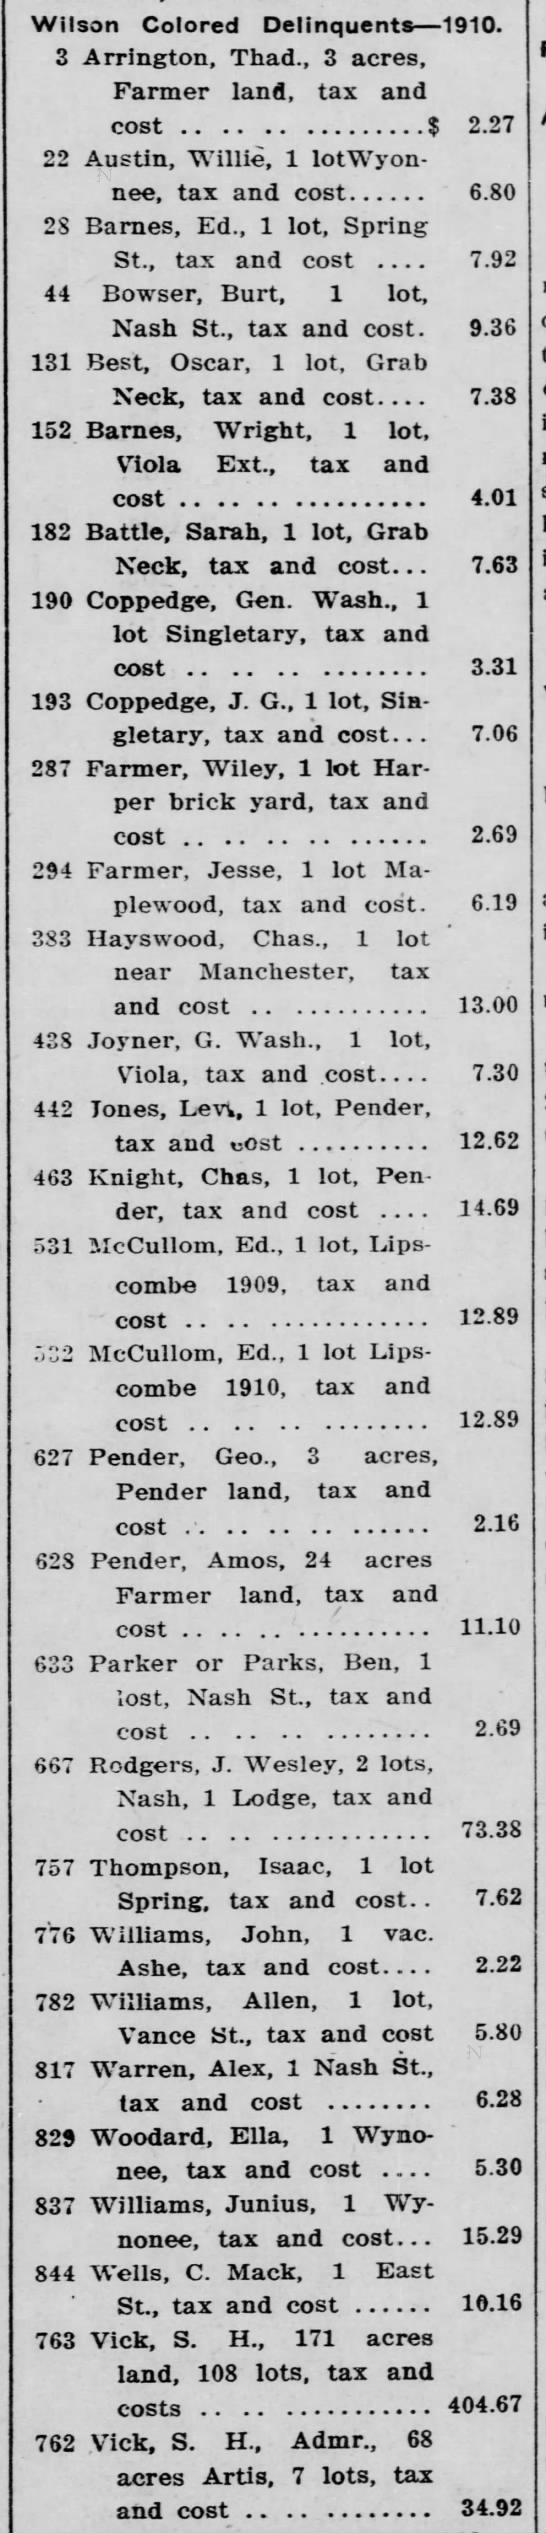 5-26-1911